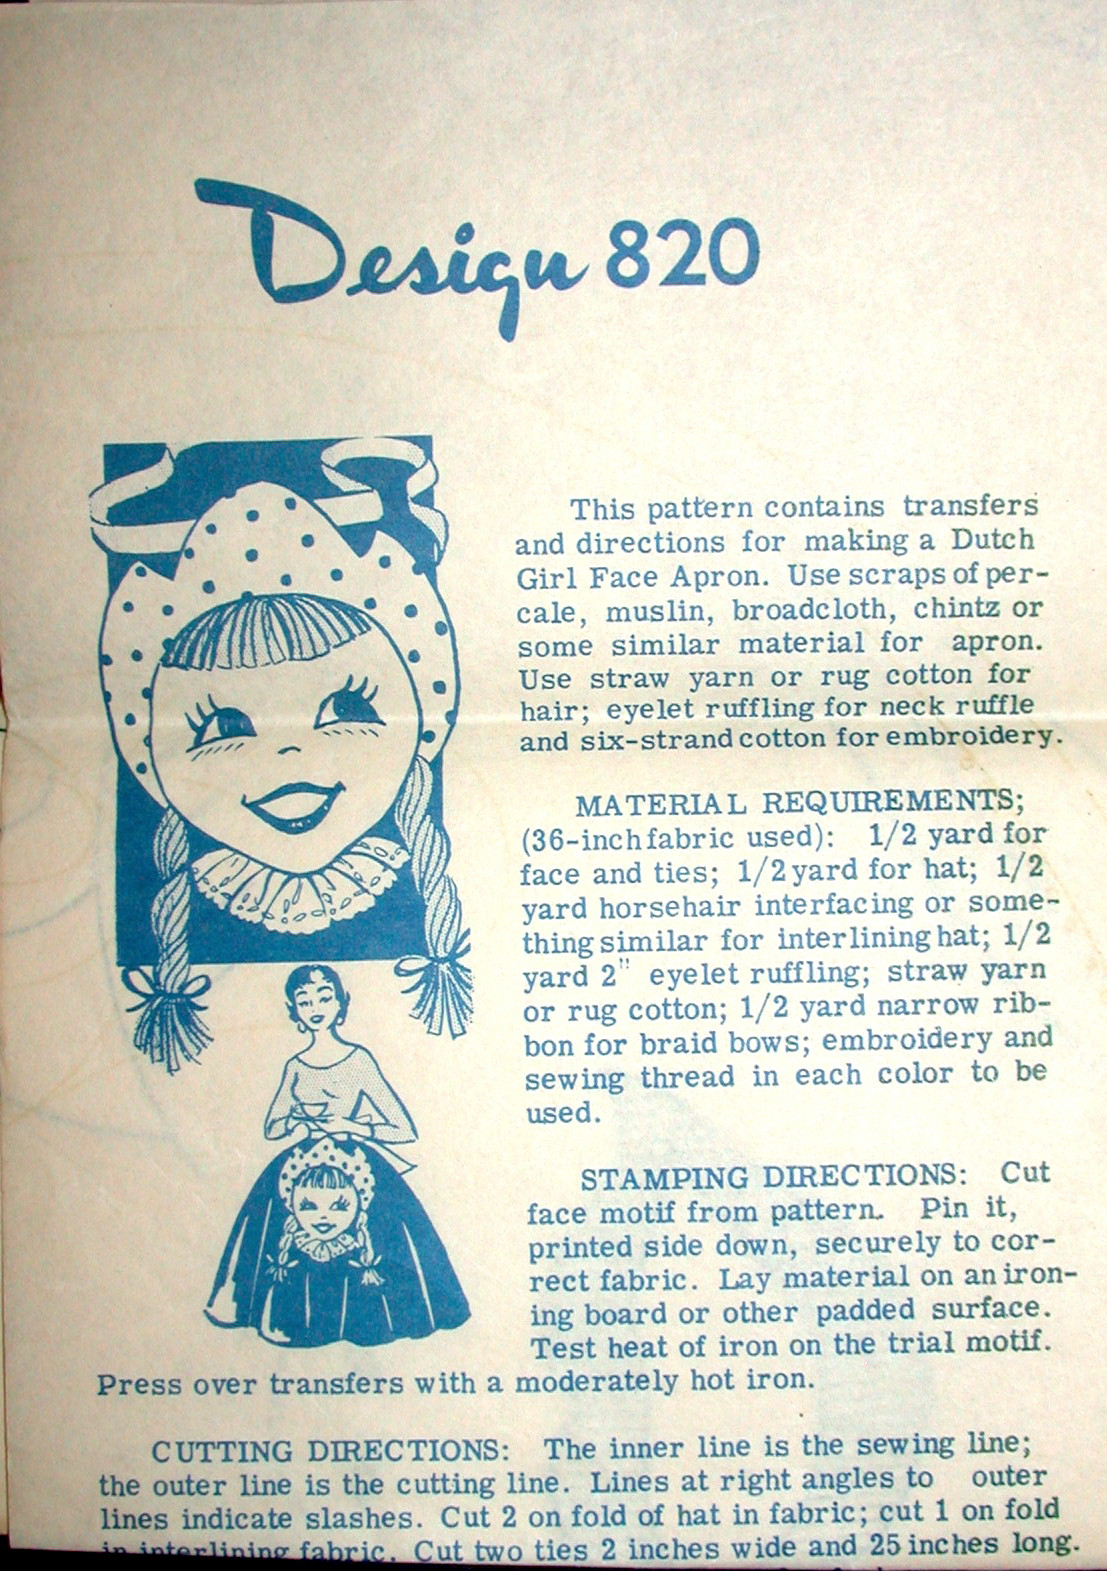 File:Design820.jpg